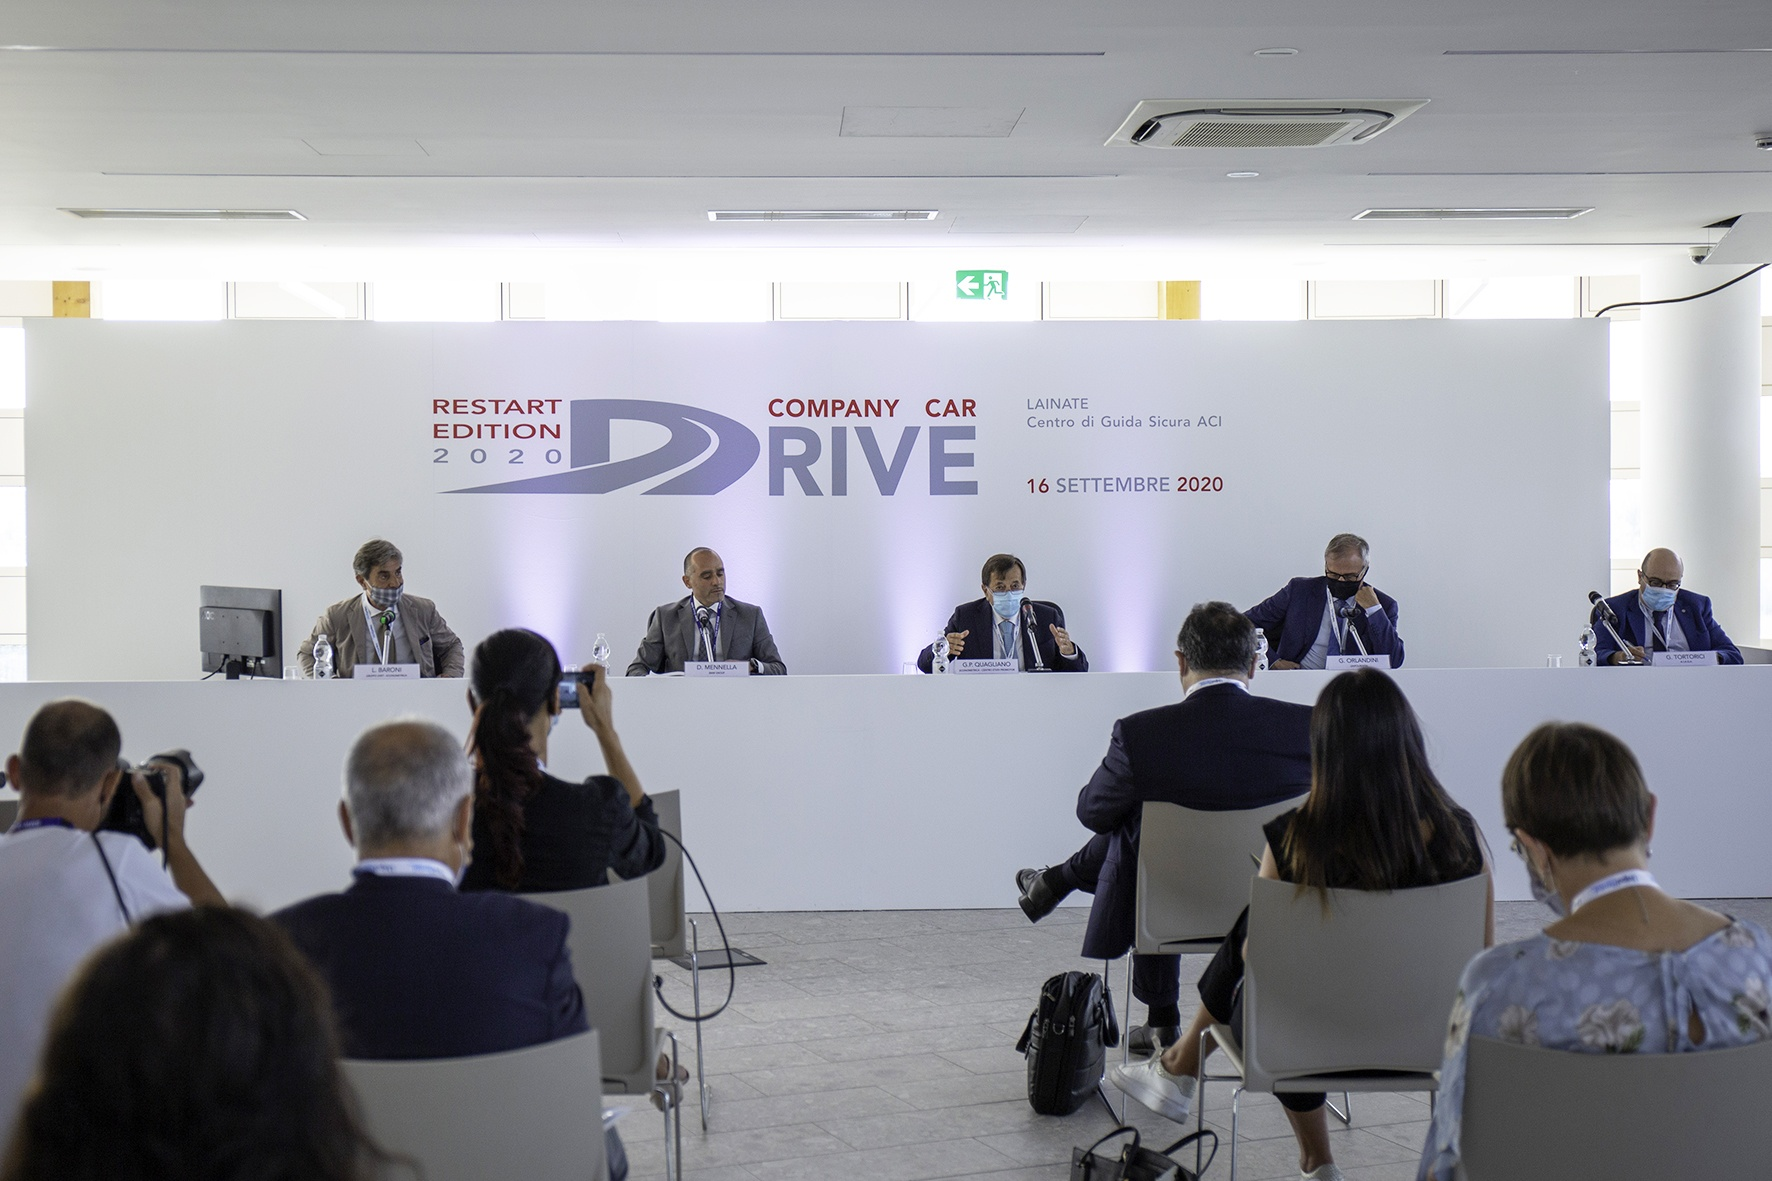 Mobilità elettrica protagonista a Company Car Drive 2021